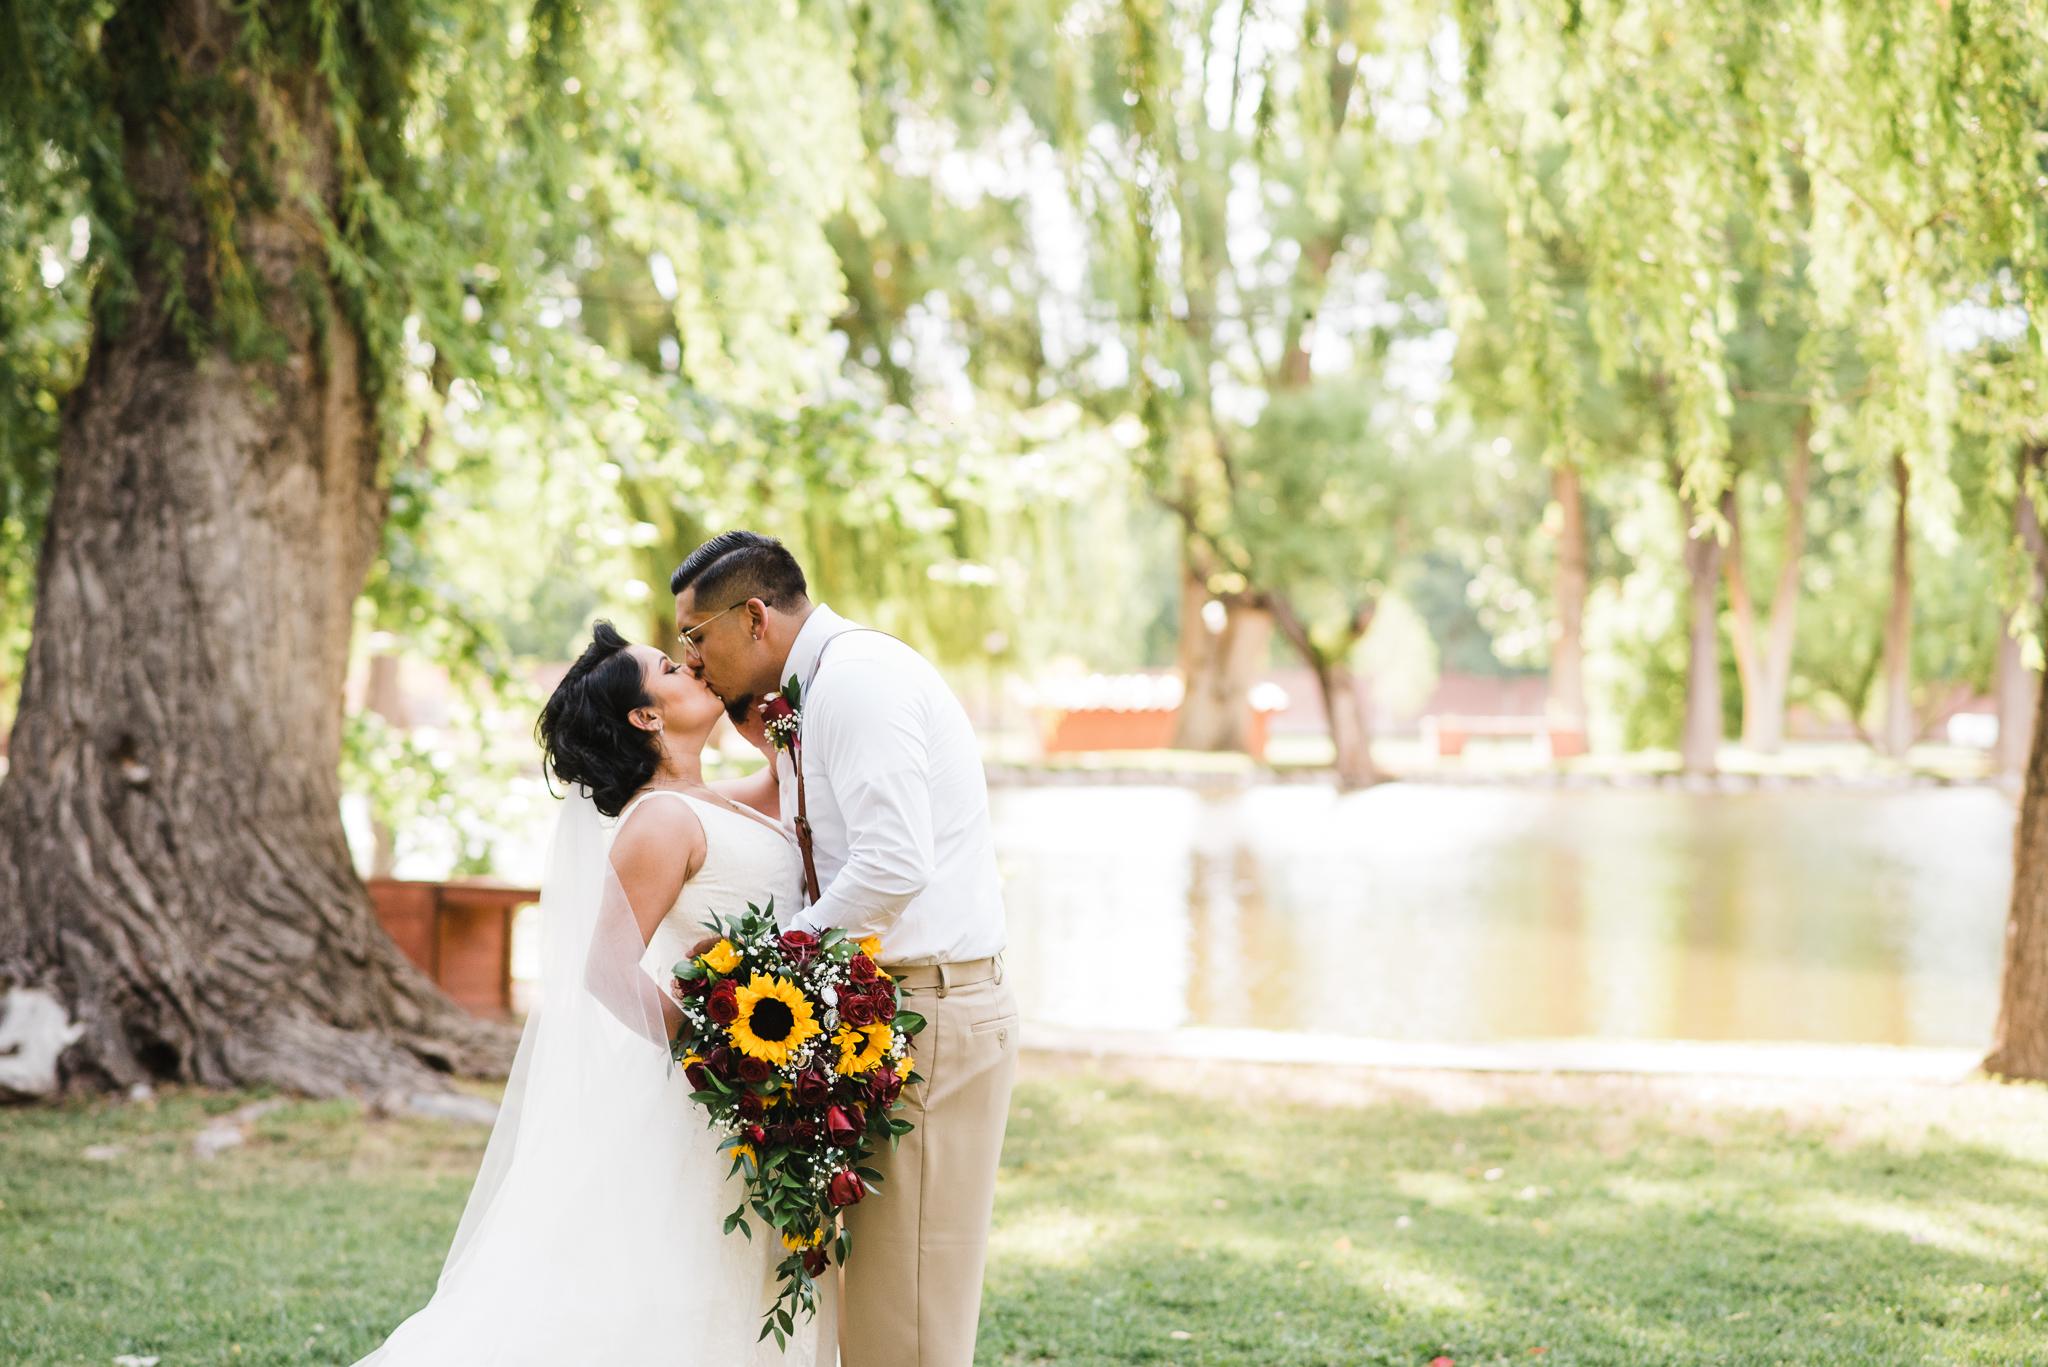 Chacon Wedding Blog-49.jpg